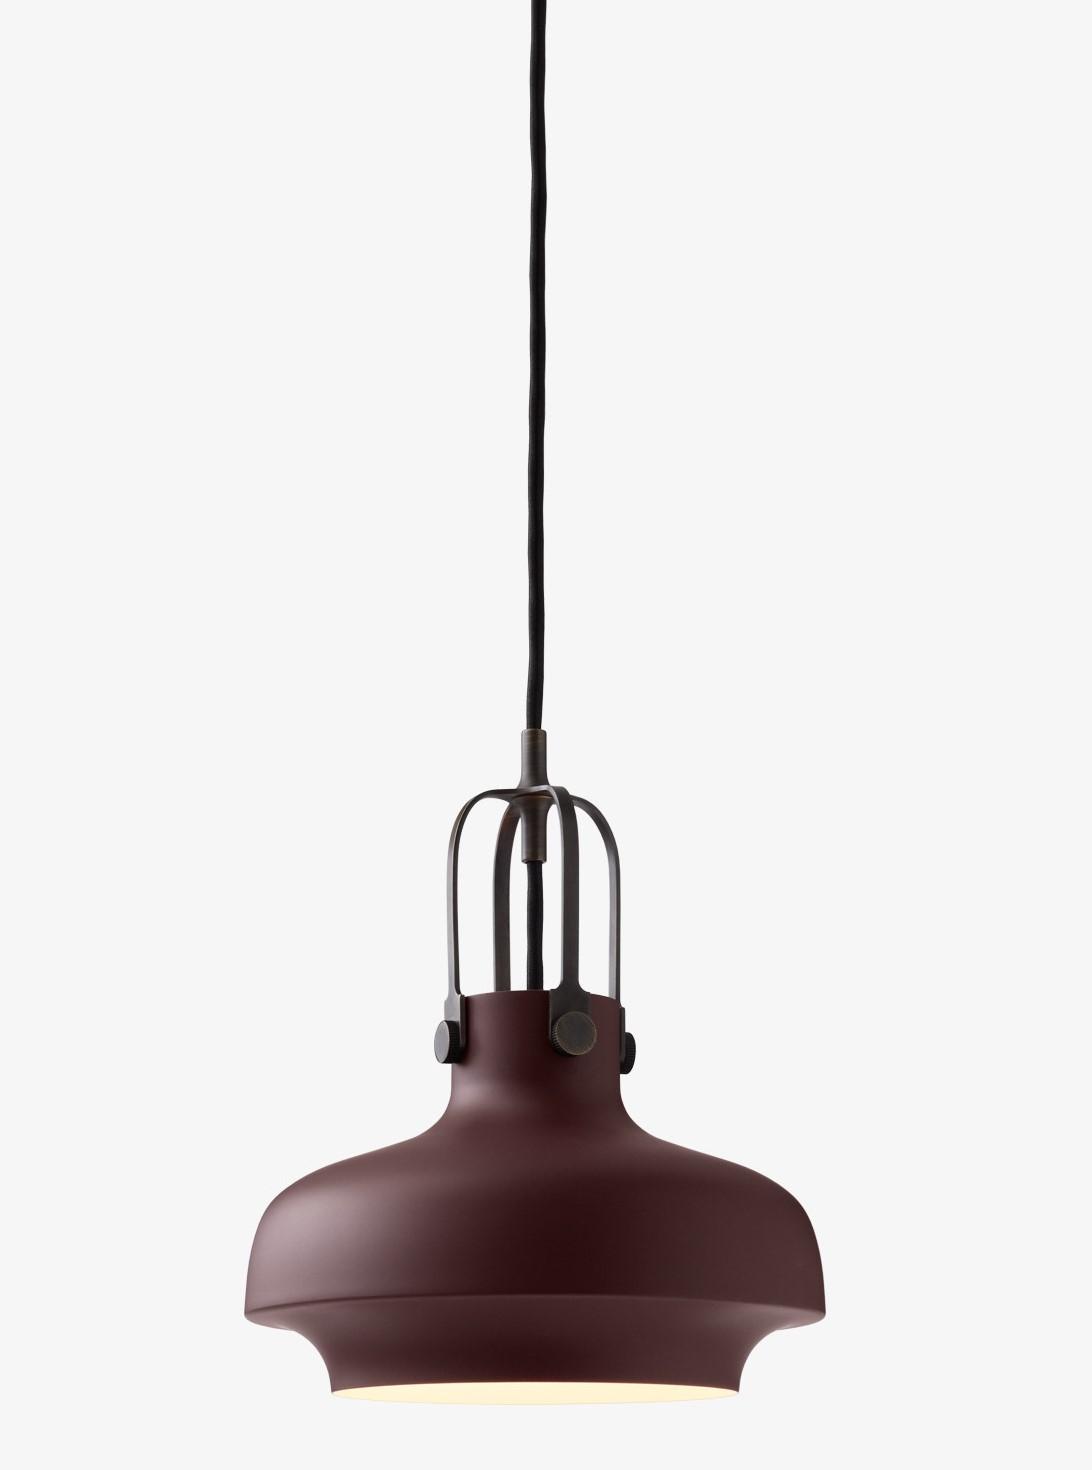 tradition Copenhagen hanglamp SC6 Plum